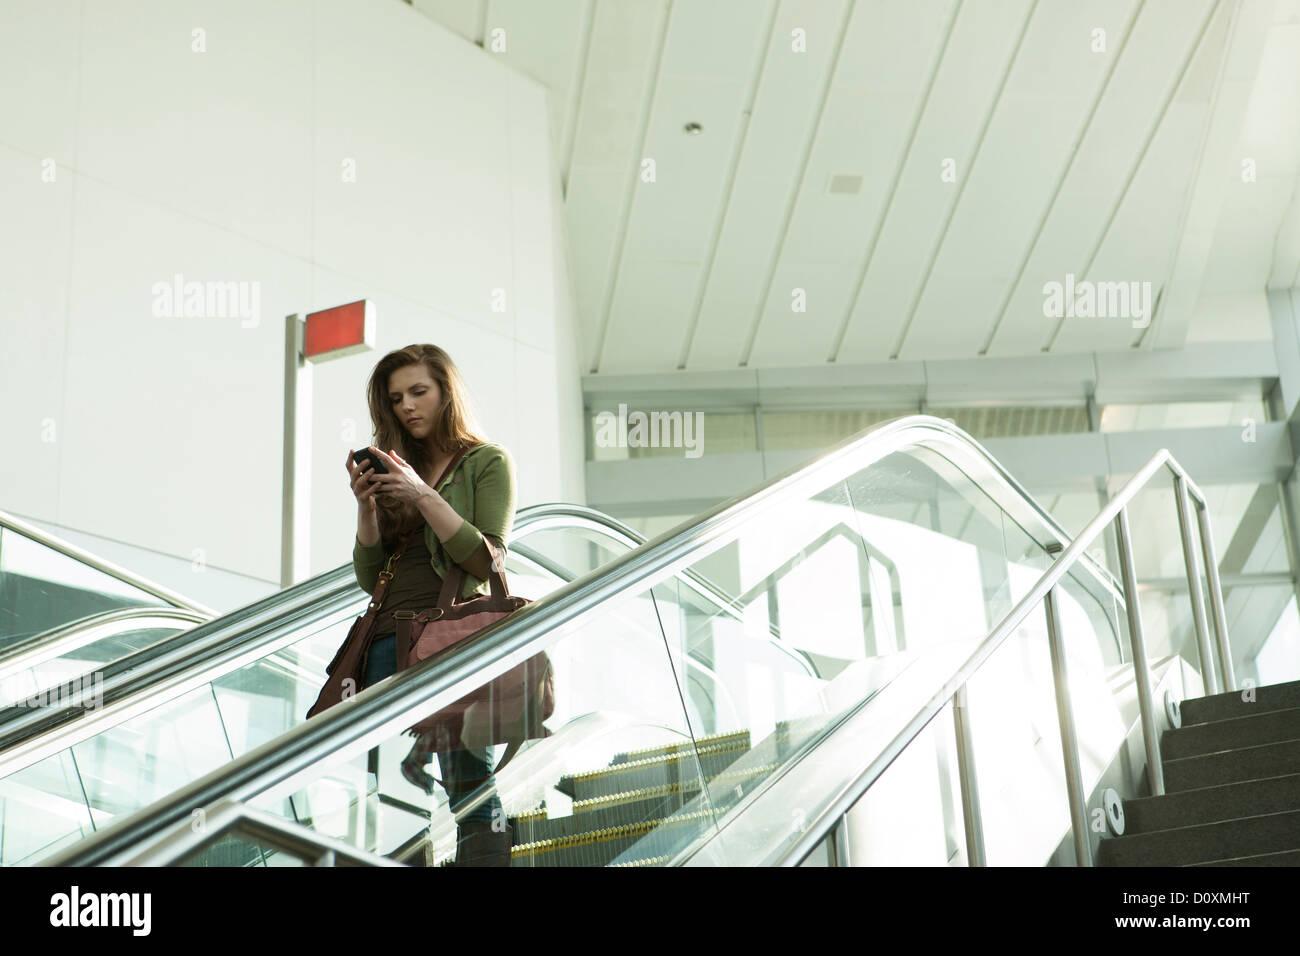 Young woman on escalator using smartphone - Stock Image